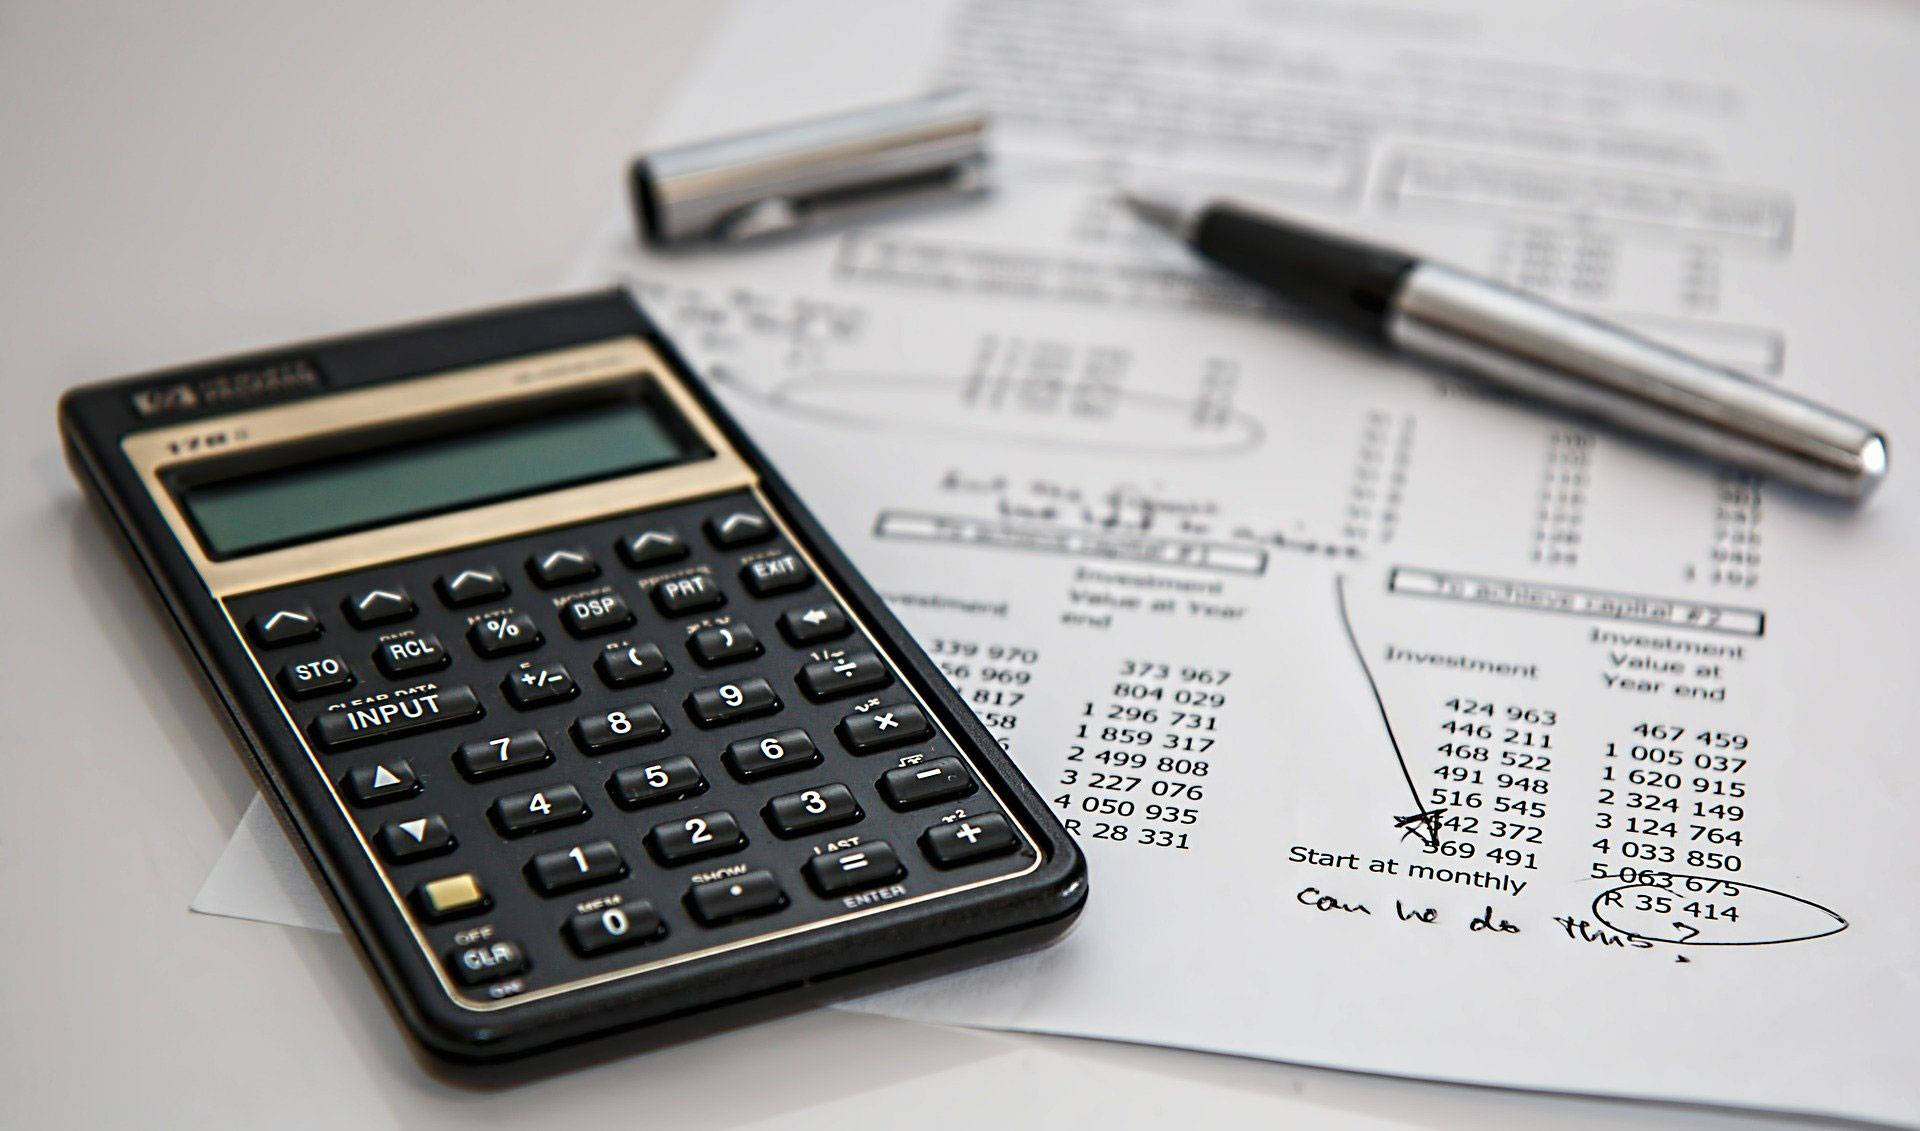 Imagem representa cálculo de Imposto ICMS